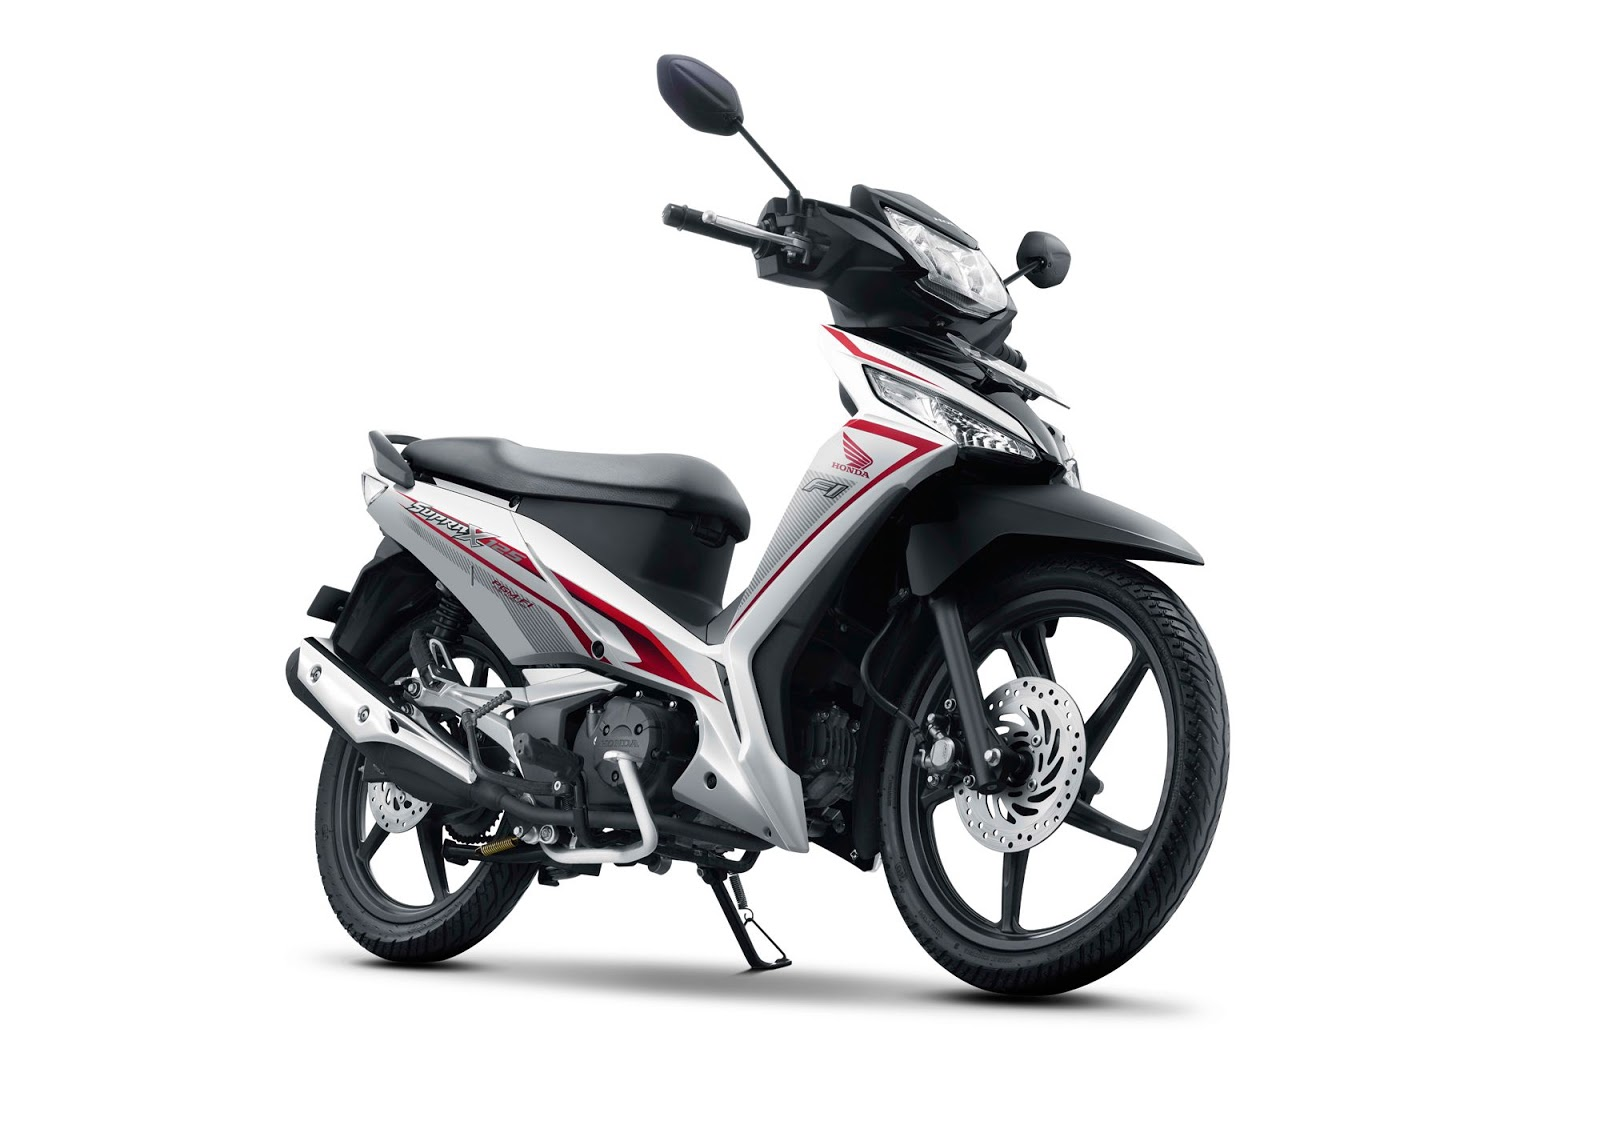 Harga dan Spesifikasi Motor Honda Supra X 125 FI Terbaru 2018